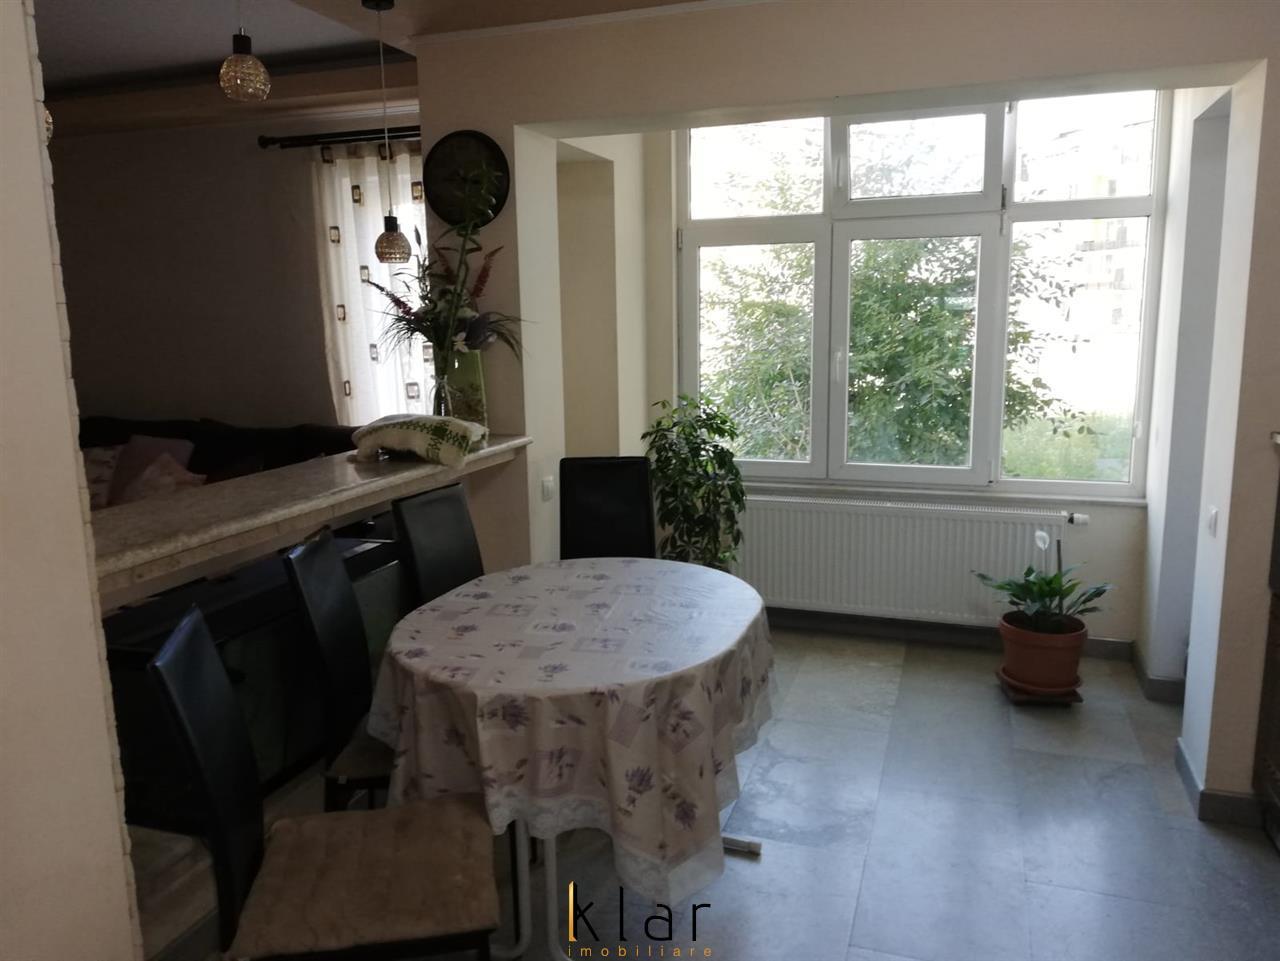 Apartament de vanzare 3 camere in zona strazii Florilor!